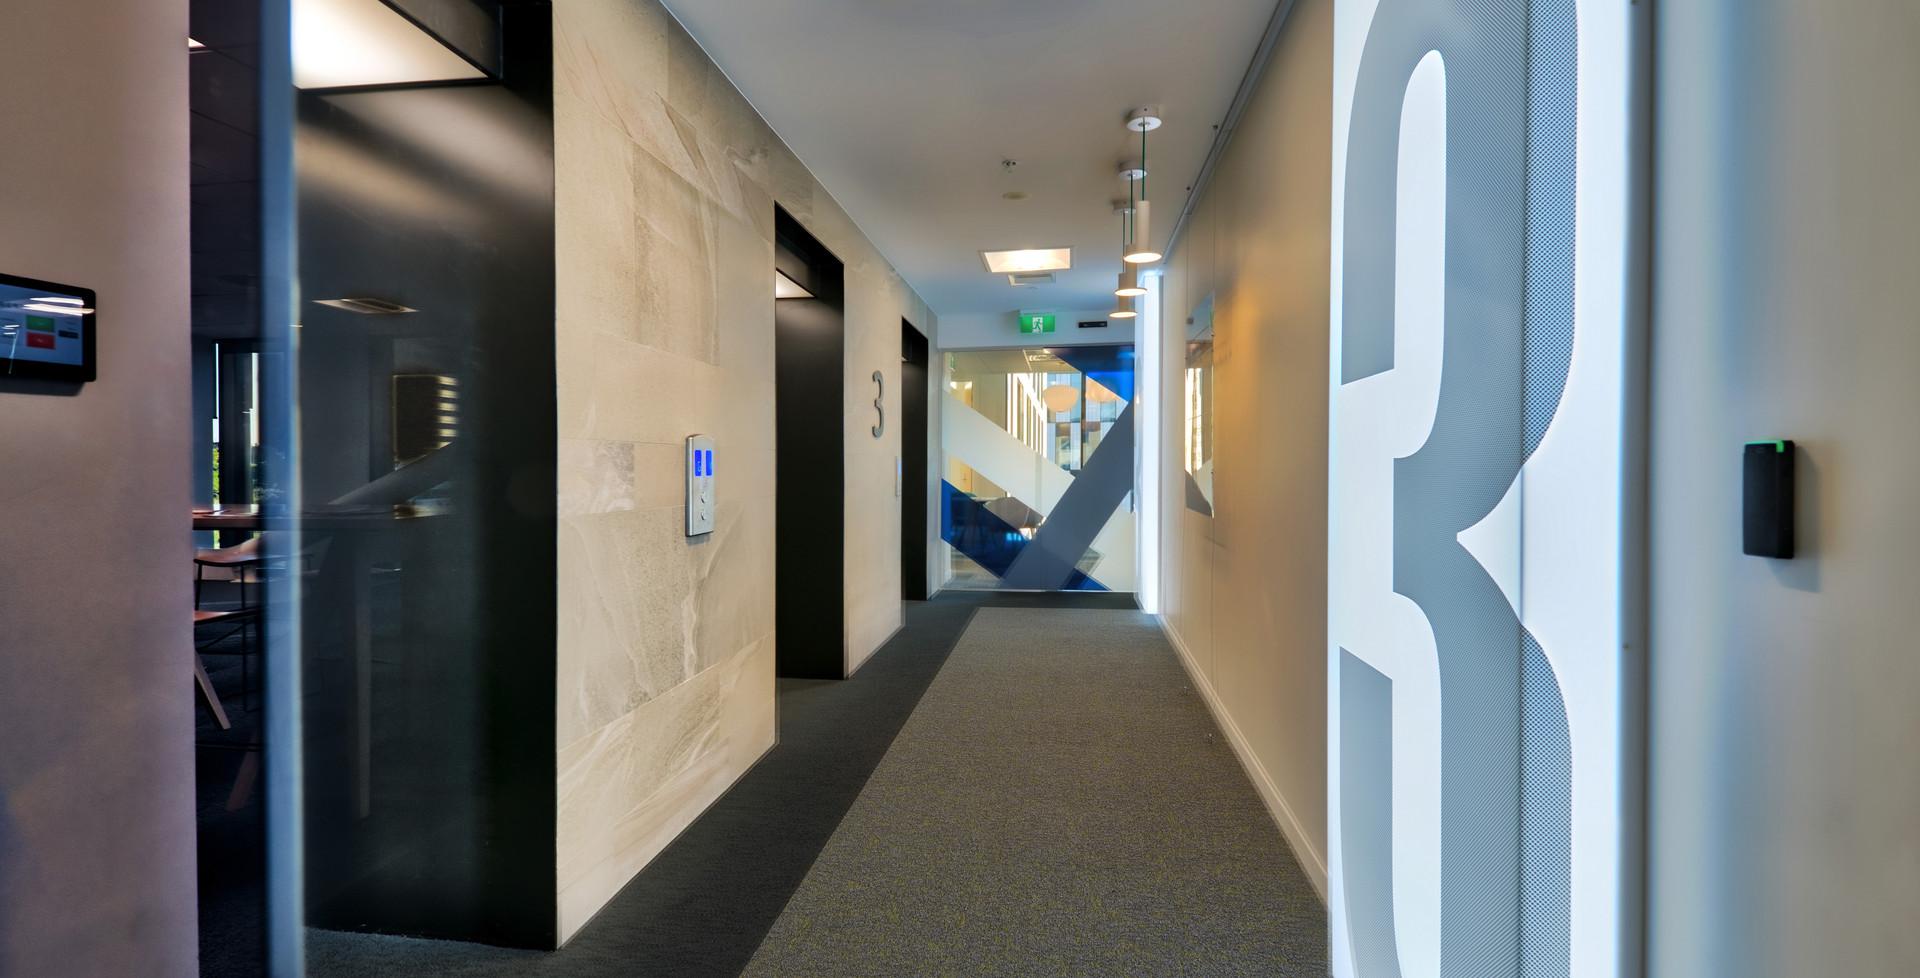 Lift Lobby & Floor Level Identification